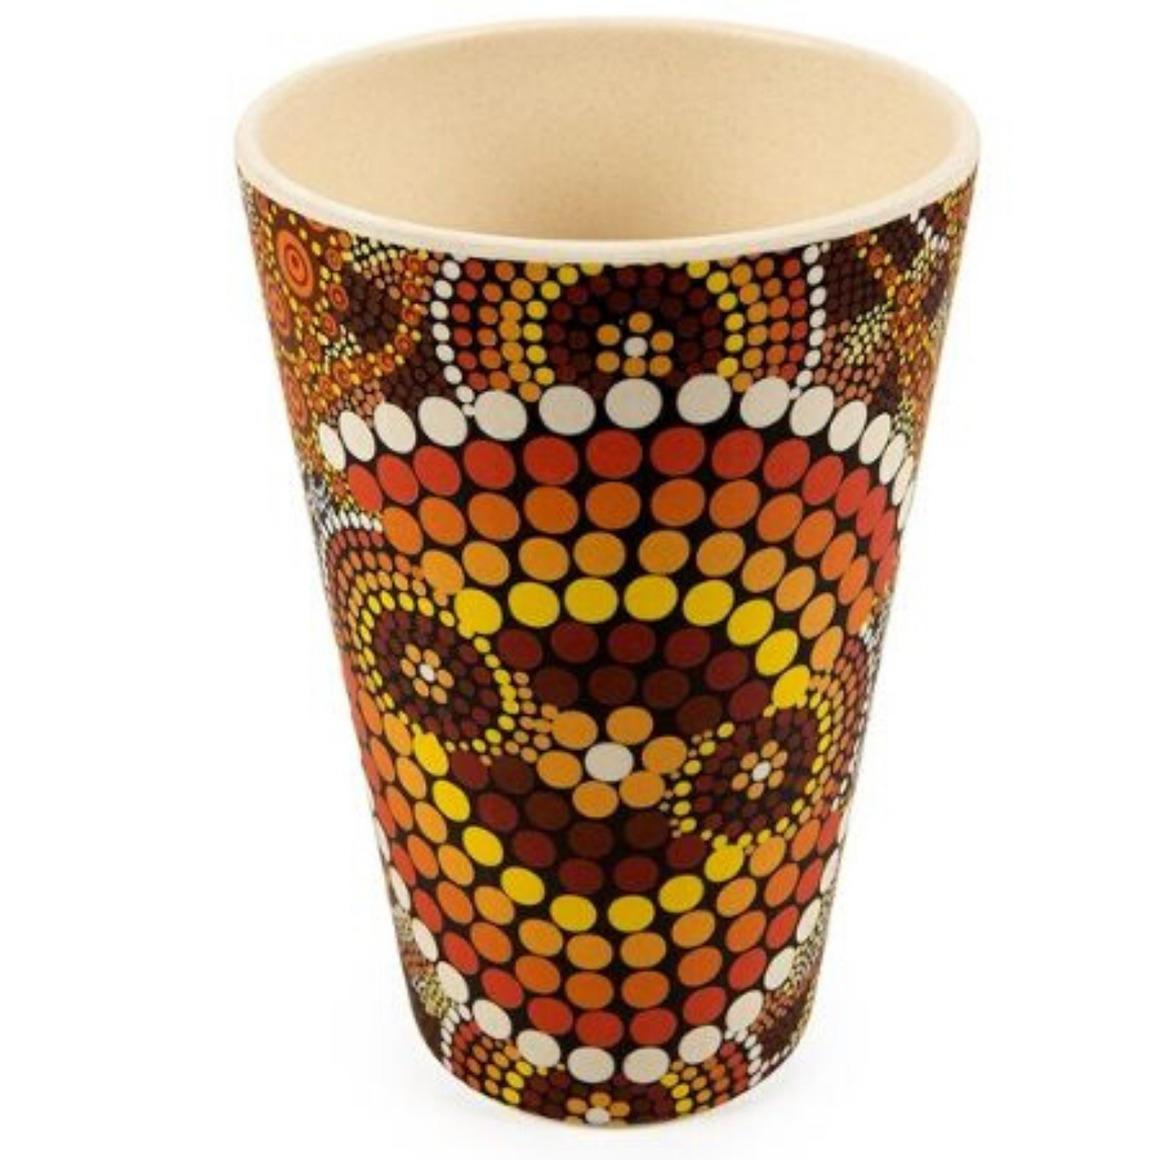 Tumblers Bamboo Aboriginal Design  - Colours of the Land Design - Colin Jones  (Set of 2)   Trada Marketplace